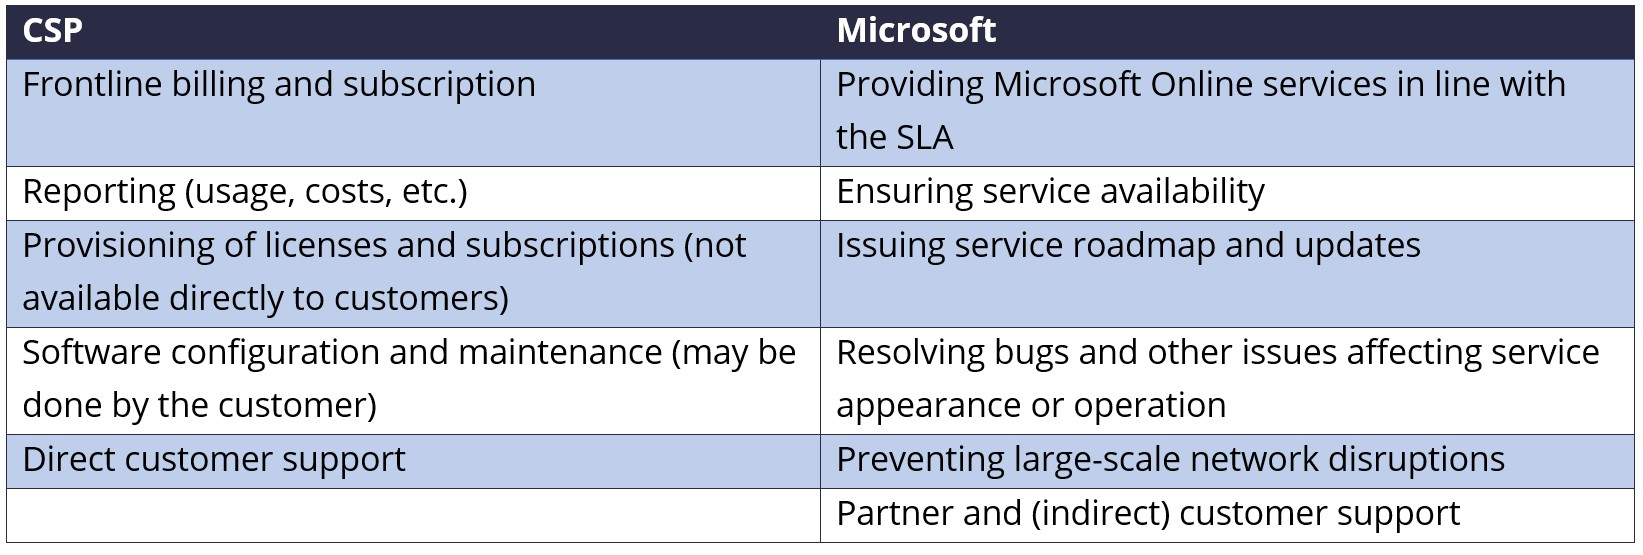 Microsoft and CSP responsibilities